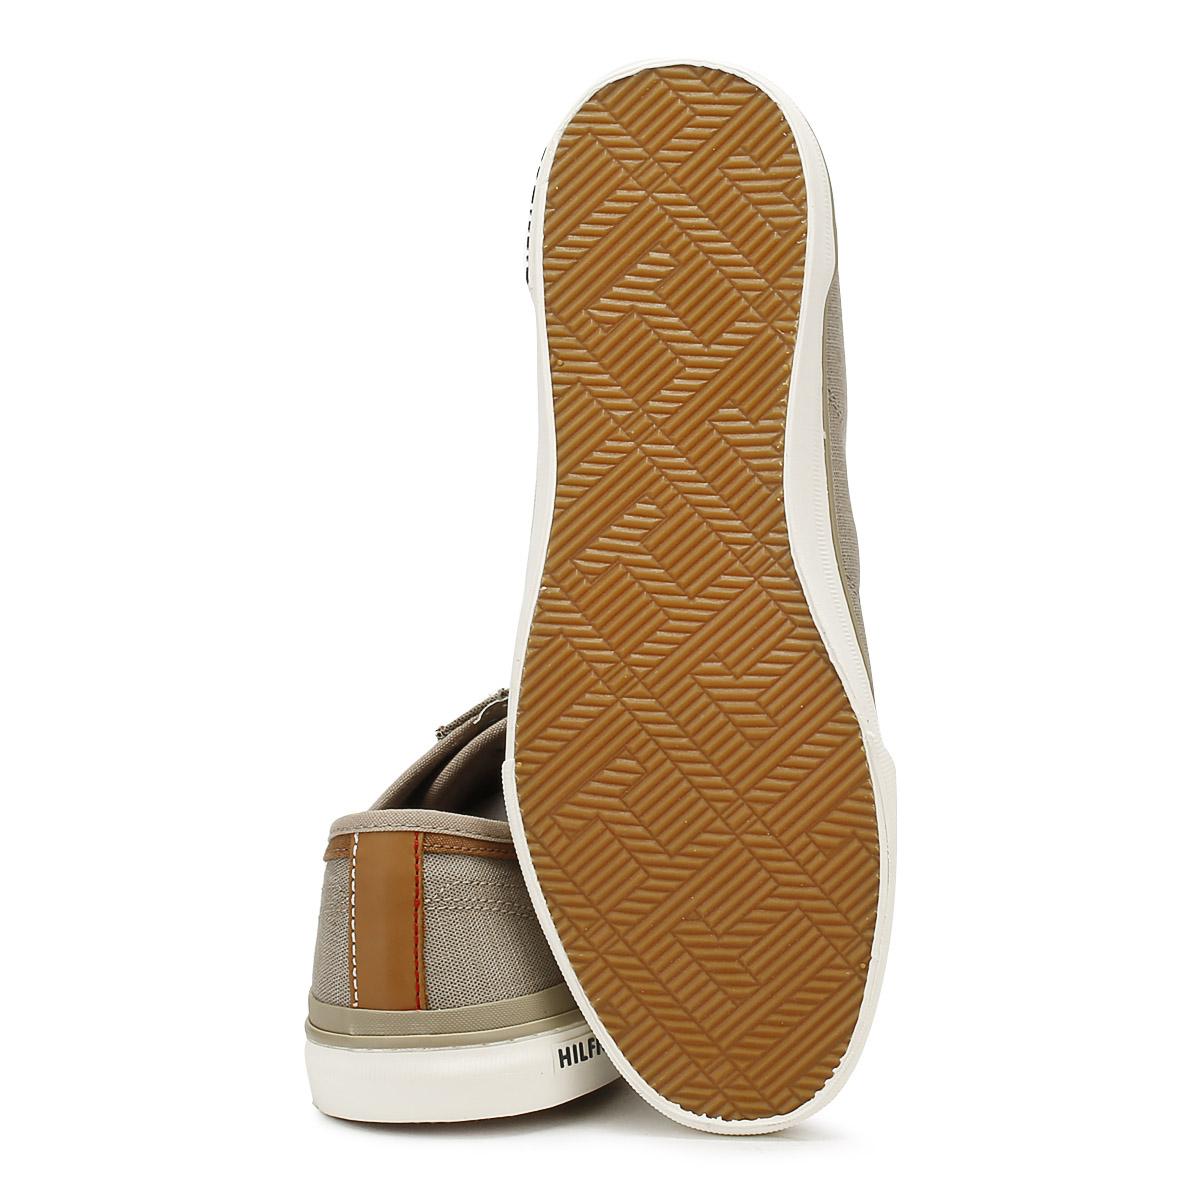 6cbe40bb7 Tommy Hilfiger Mens Textile Trainers Cobblestone Grey Core Lace Up Casual  Shoes